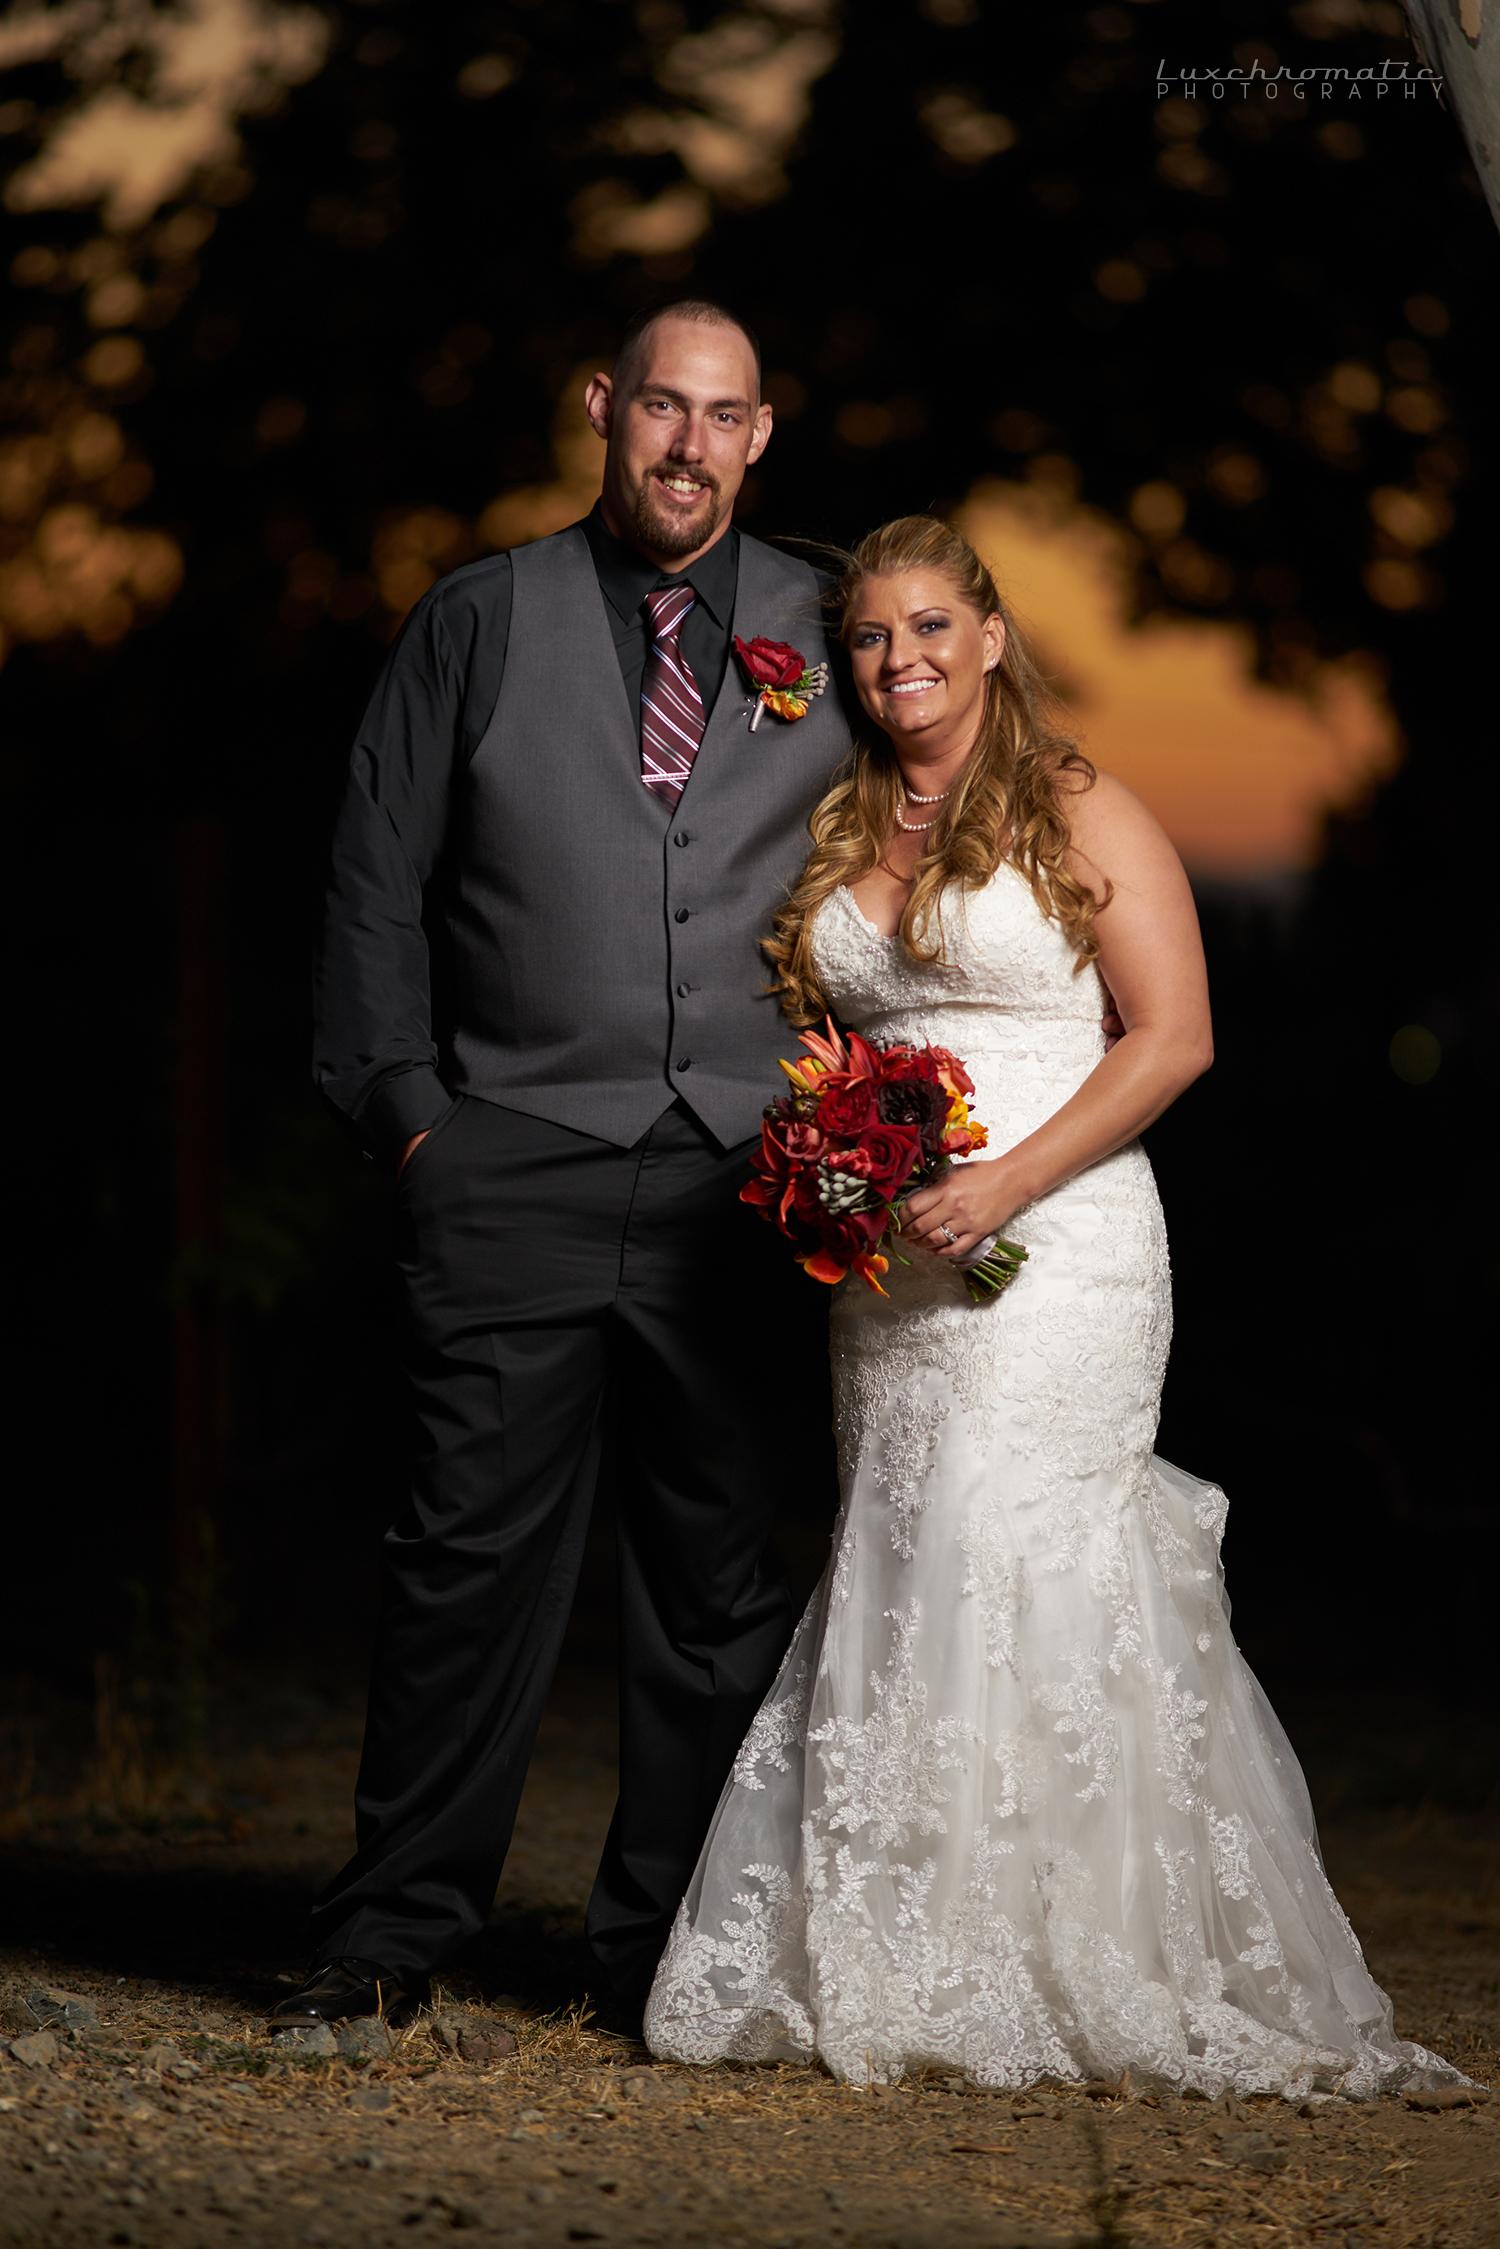 081217_Rachel_Chris_a0750-weddingdress-bride-weddingphotography-weddingphotographer-bridal-groom-wedding-engagementring-proposal-brides-diamondring-sonyalpha-sony-sonya9-sonya7rii-sanfrancisco-sf-bayarea-photographer-profoto-murrietas-well.jpg